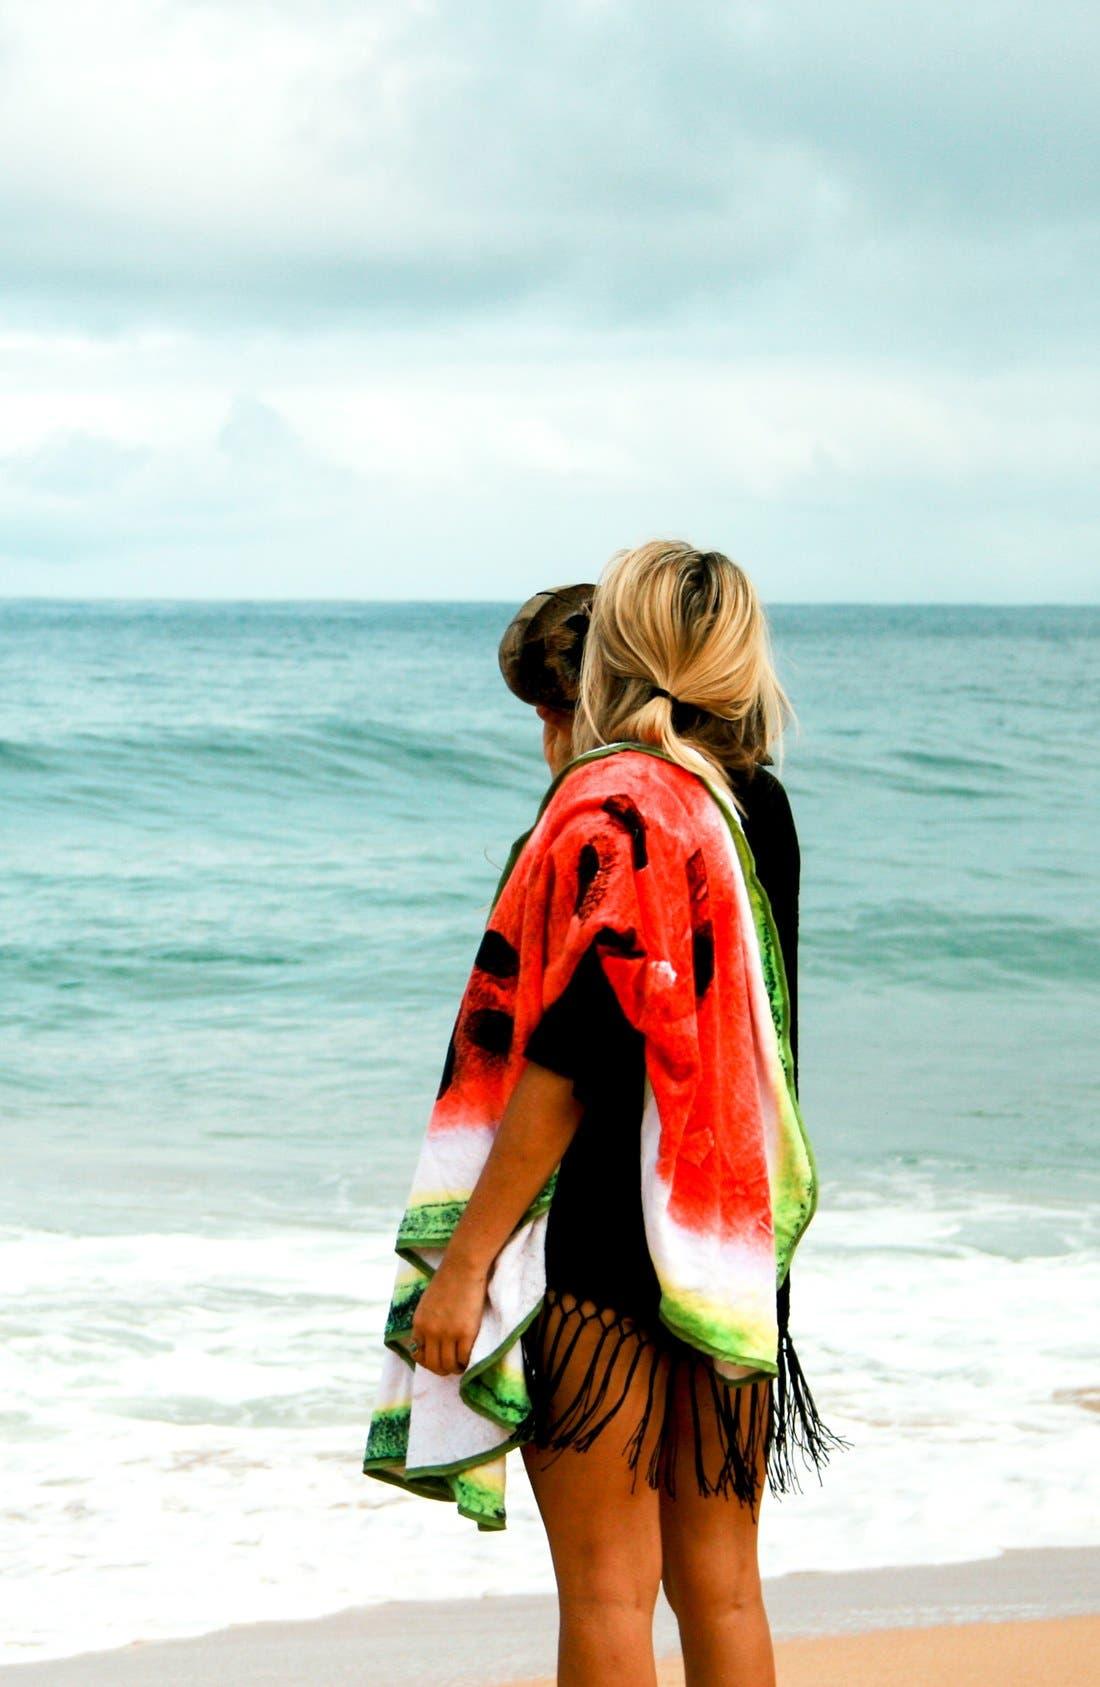 Watermelon Round Beach Towel,                             Alternate thumbnail 3, color,                             600